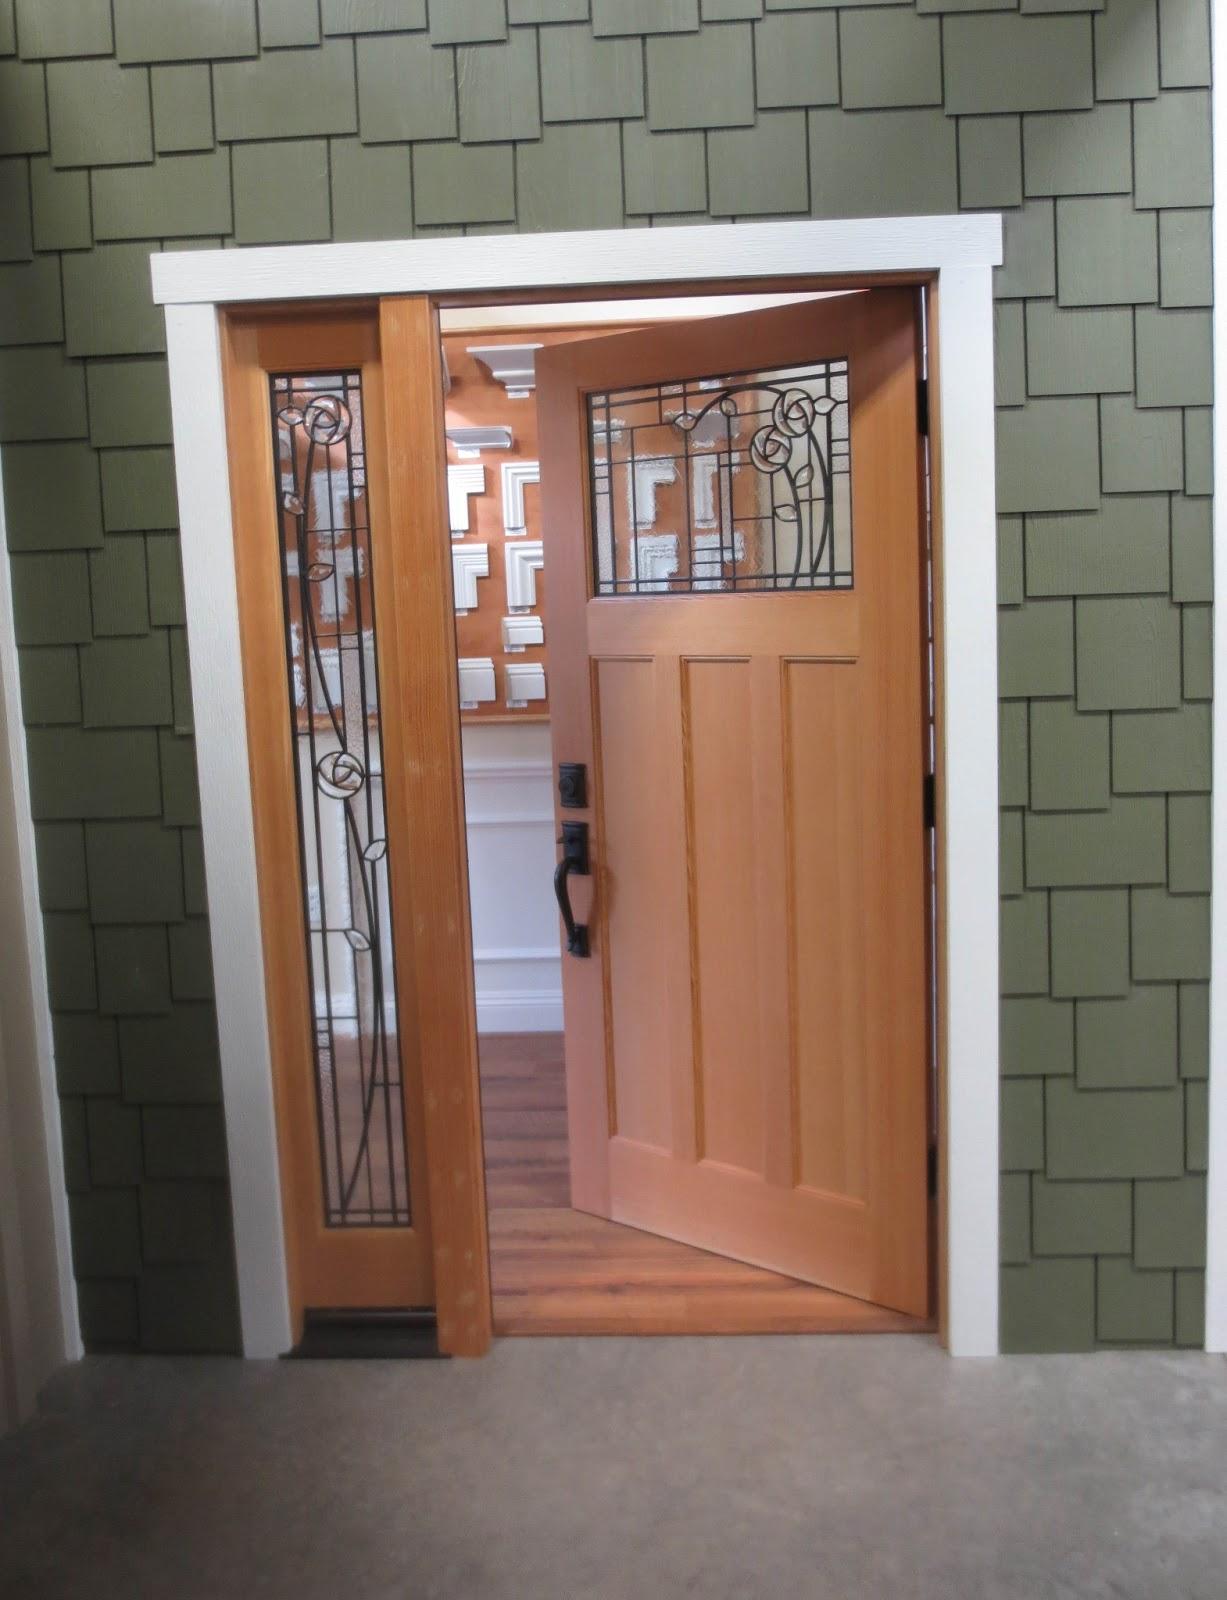 exterior doors for homes modern home house design ideas. Black Bedroom Furniture Sets. Home Design Ideas